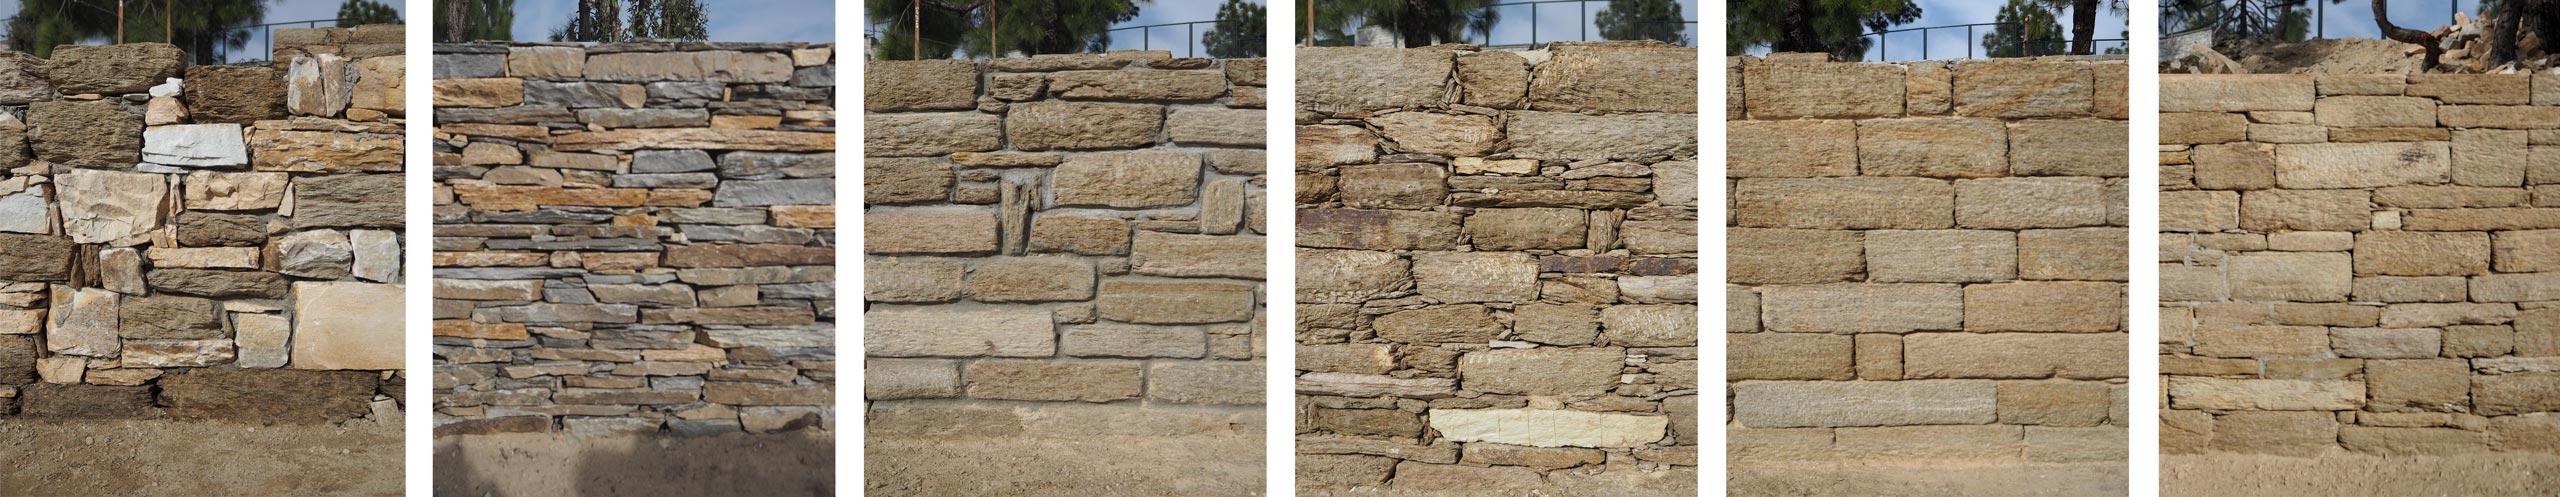 wall stone samples Himalayan Mountain Retreat in Mukteshwar